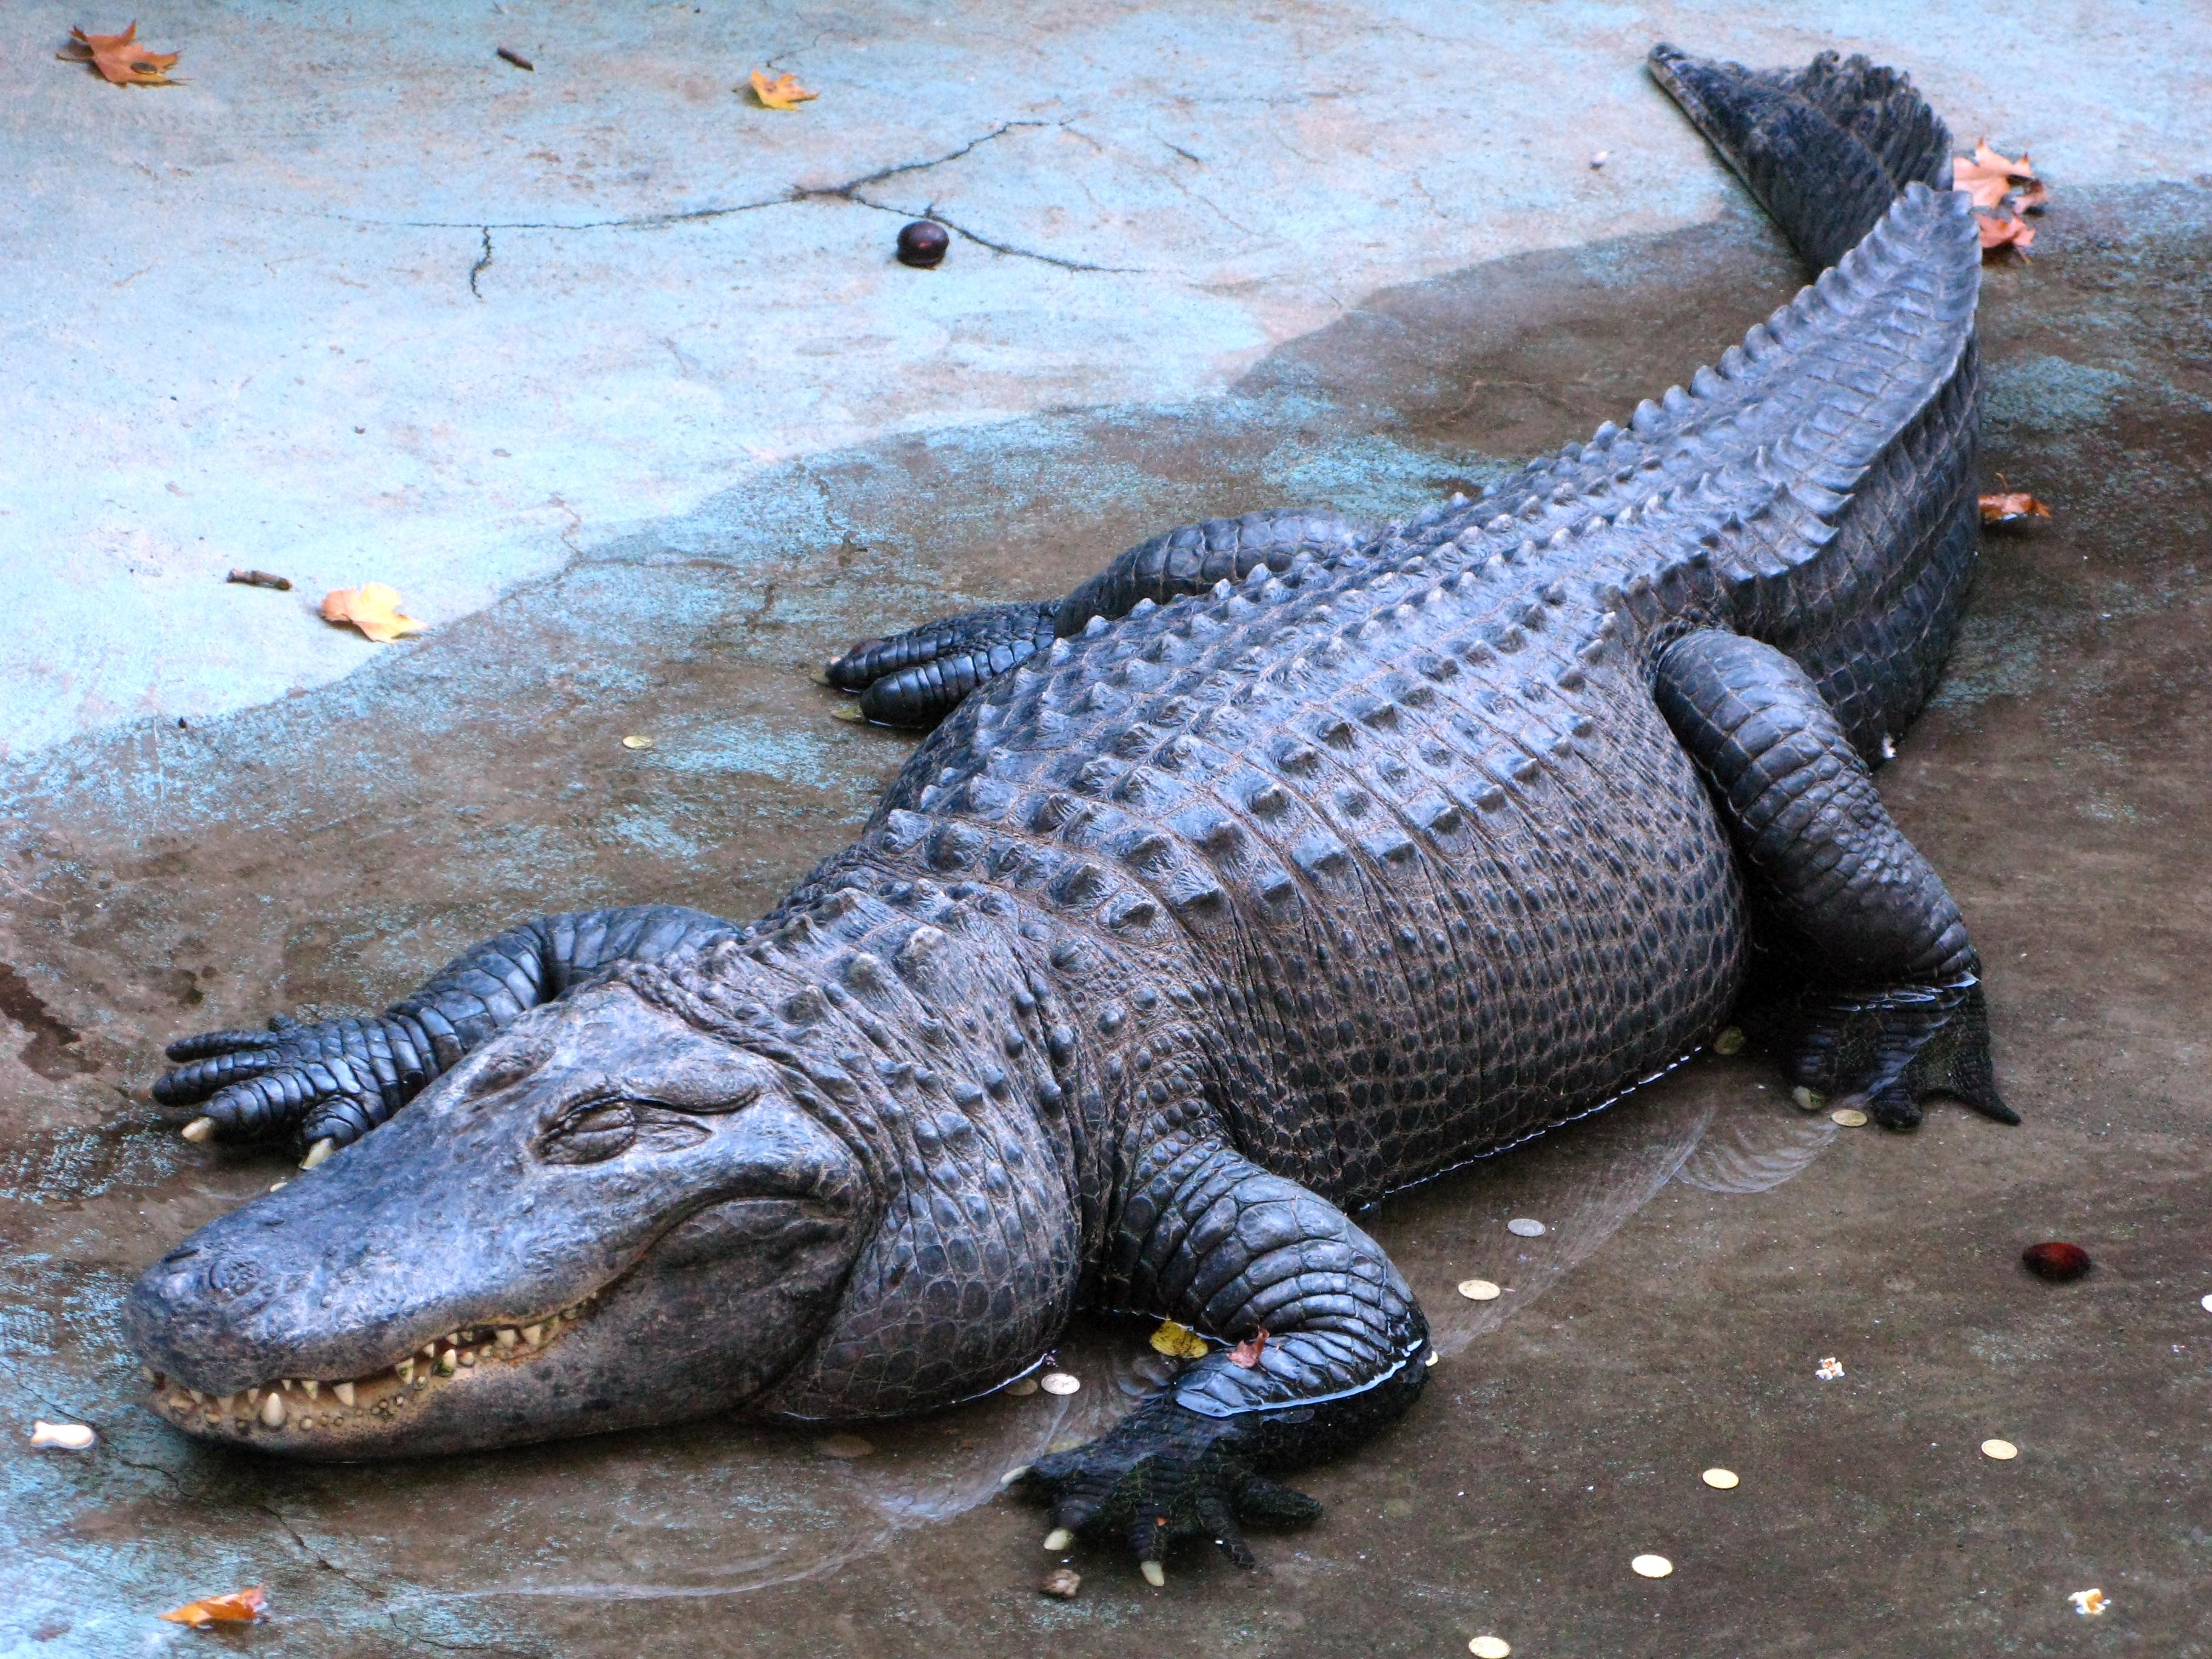 Ali the Alligator